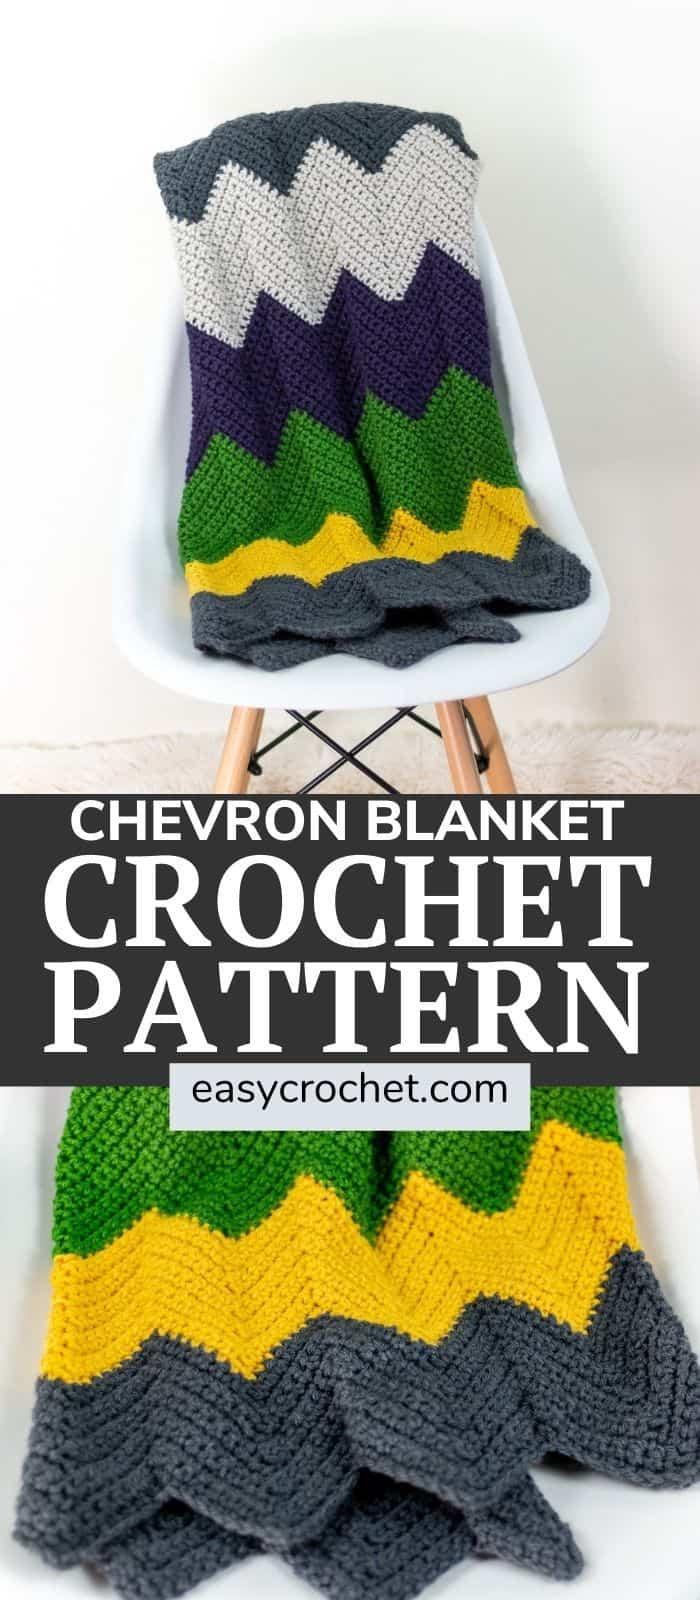 Free chevron crochet blanket pattern using bright and bold colors! Free crochet pattern from Easy Crochet via @easycrochetcom